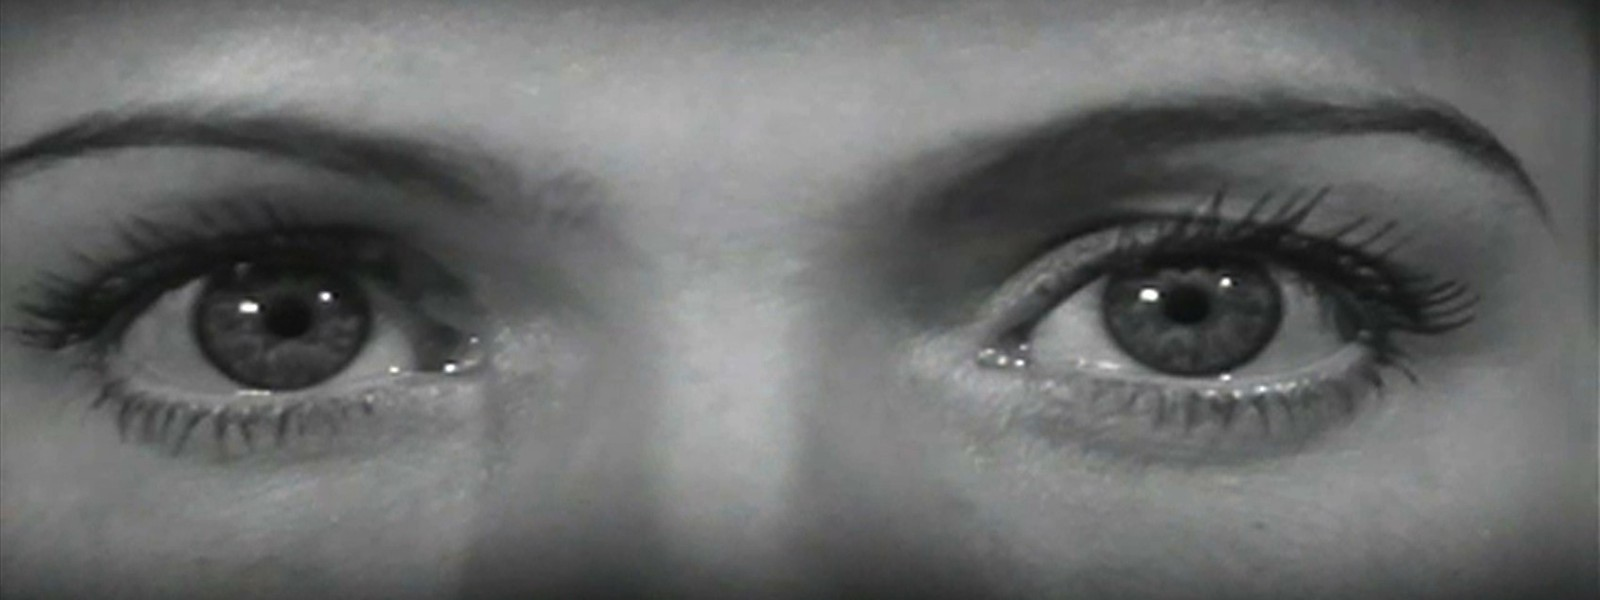 KATHLEEN, 2014, video still - Detail